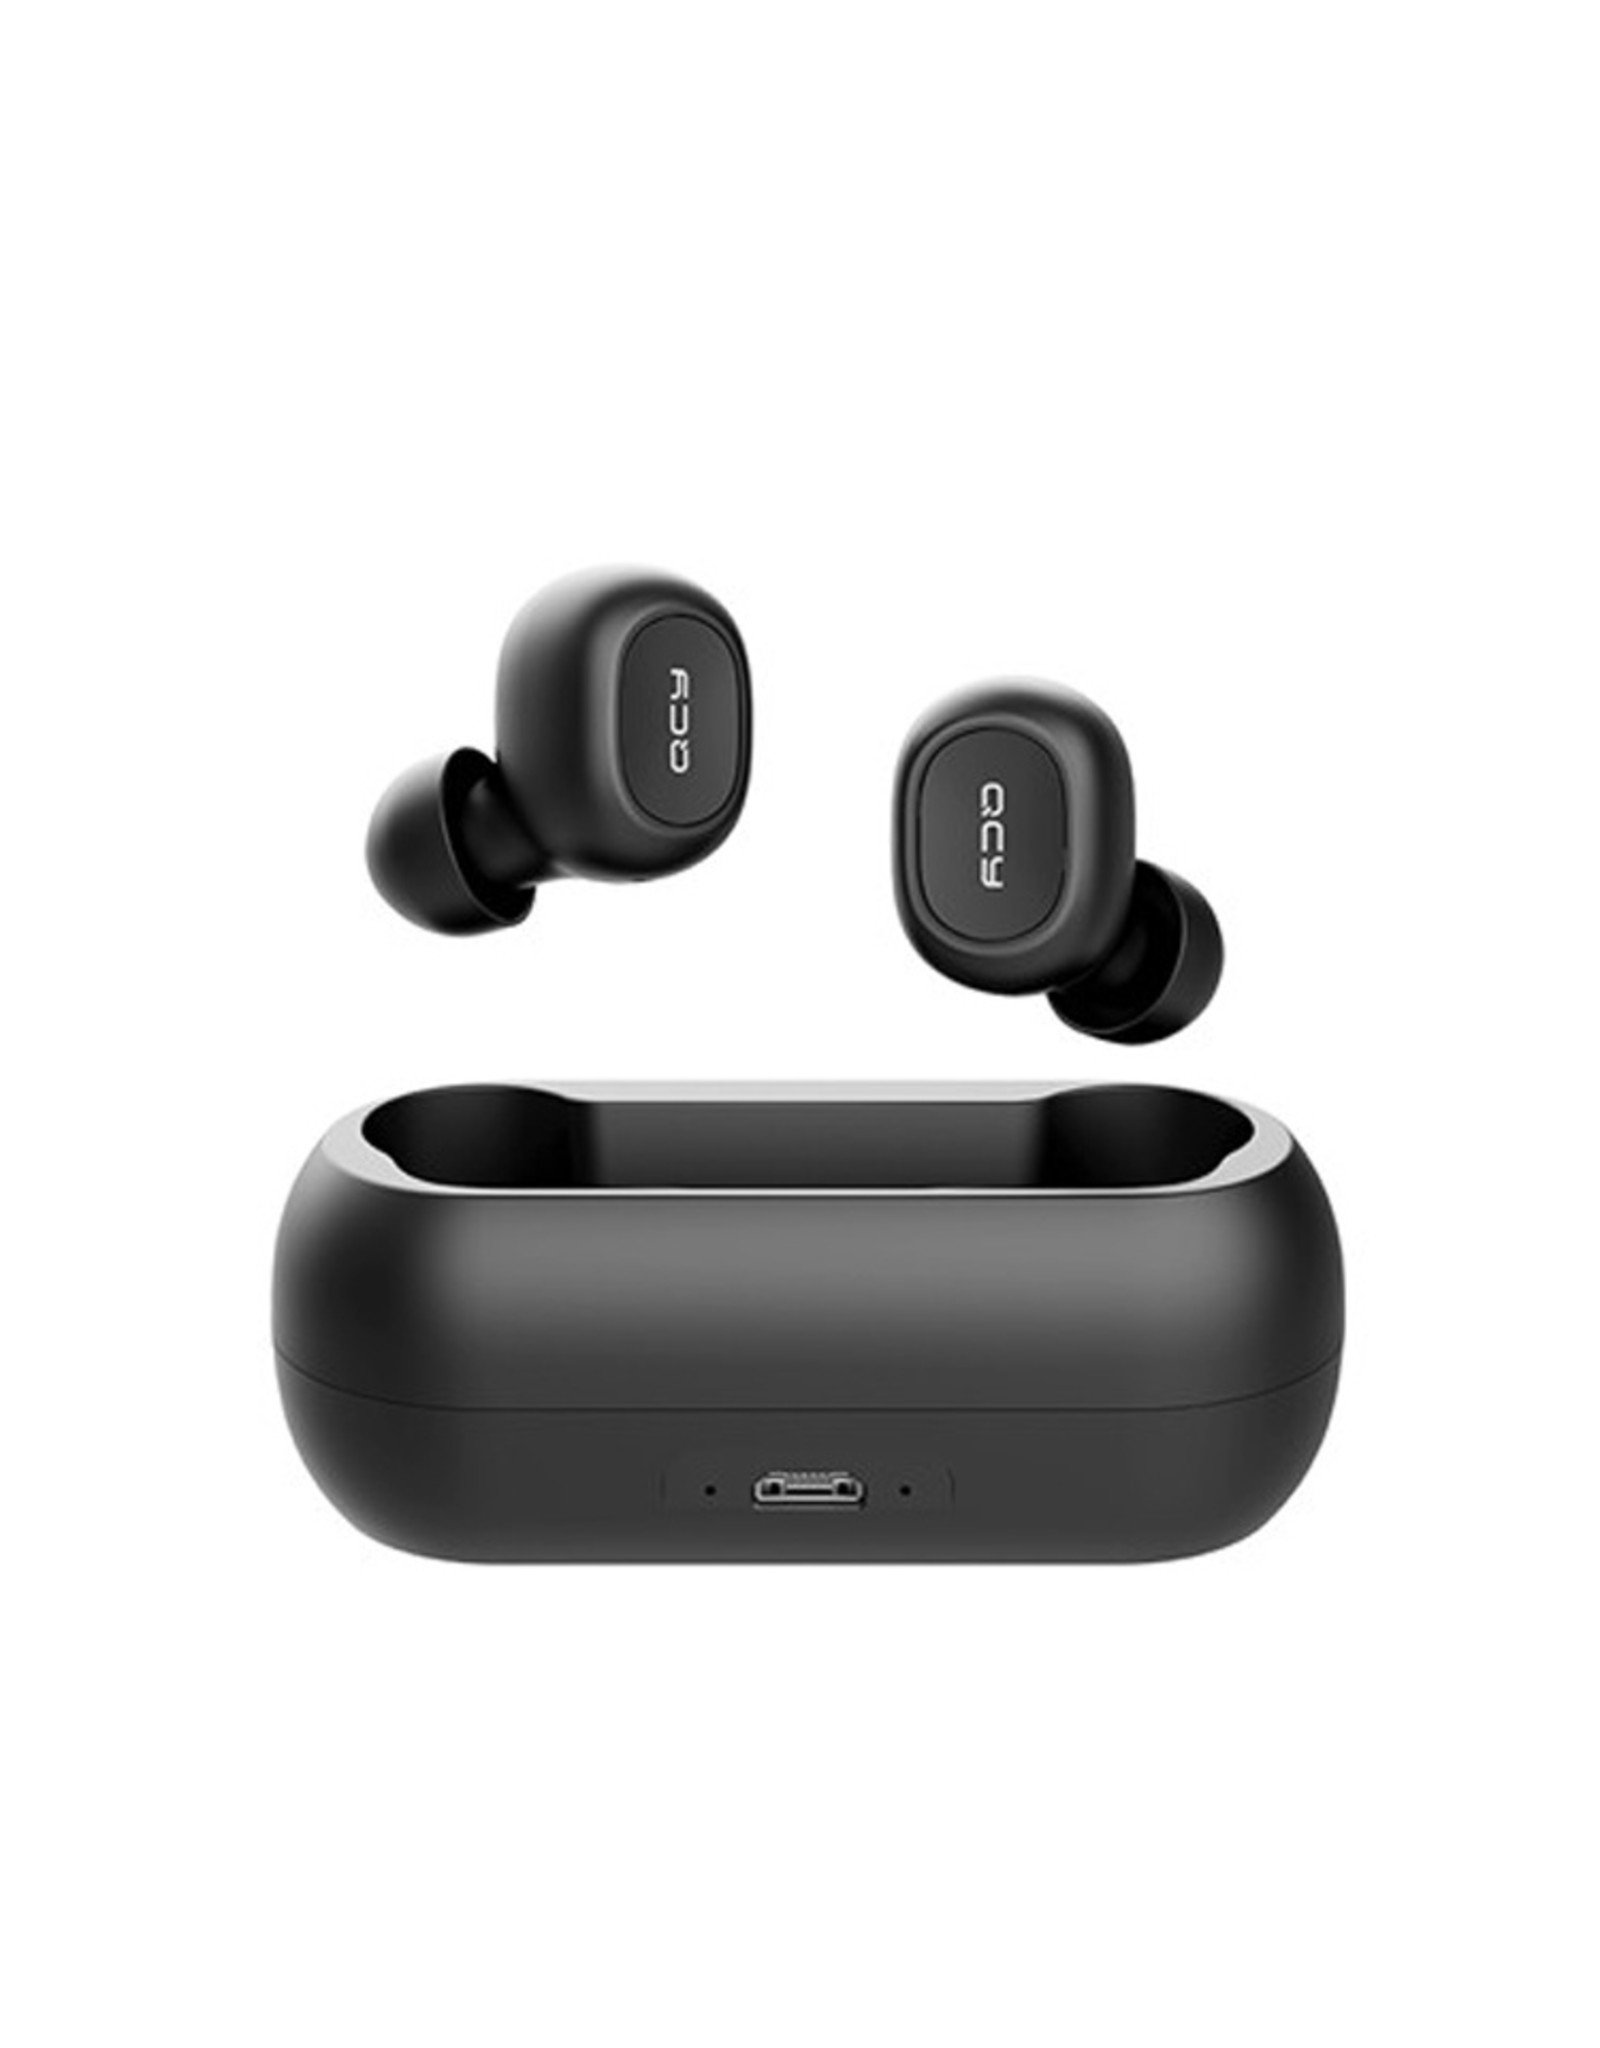 QCY QCY T1C Volledig draadloos In-Ear oordopjes (ZWART) | Bluetooth 5.0